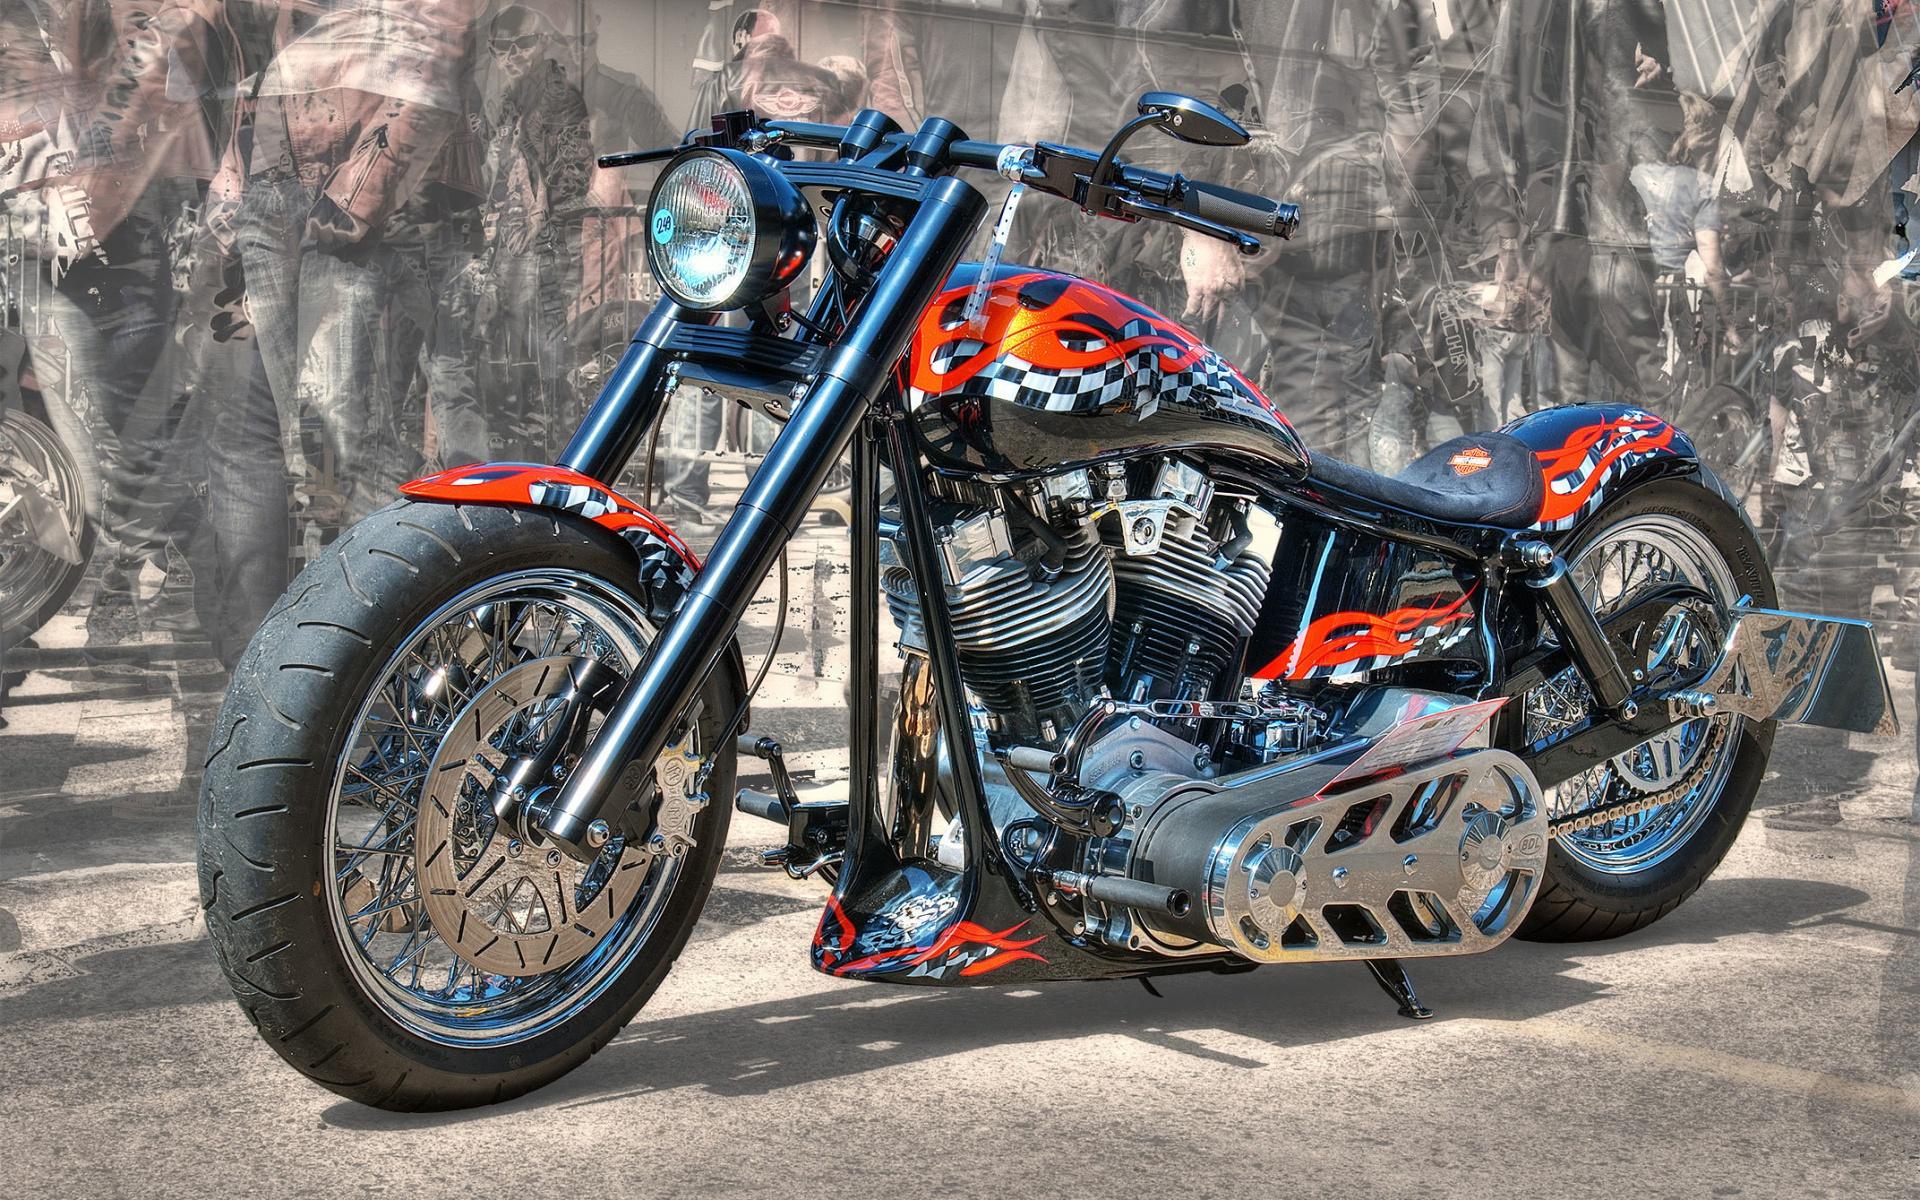 Обои Harley-Davidson, мотоцикл, тюнинг, аэрография